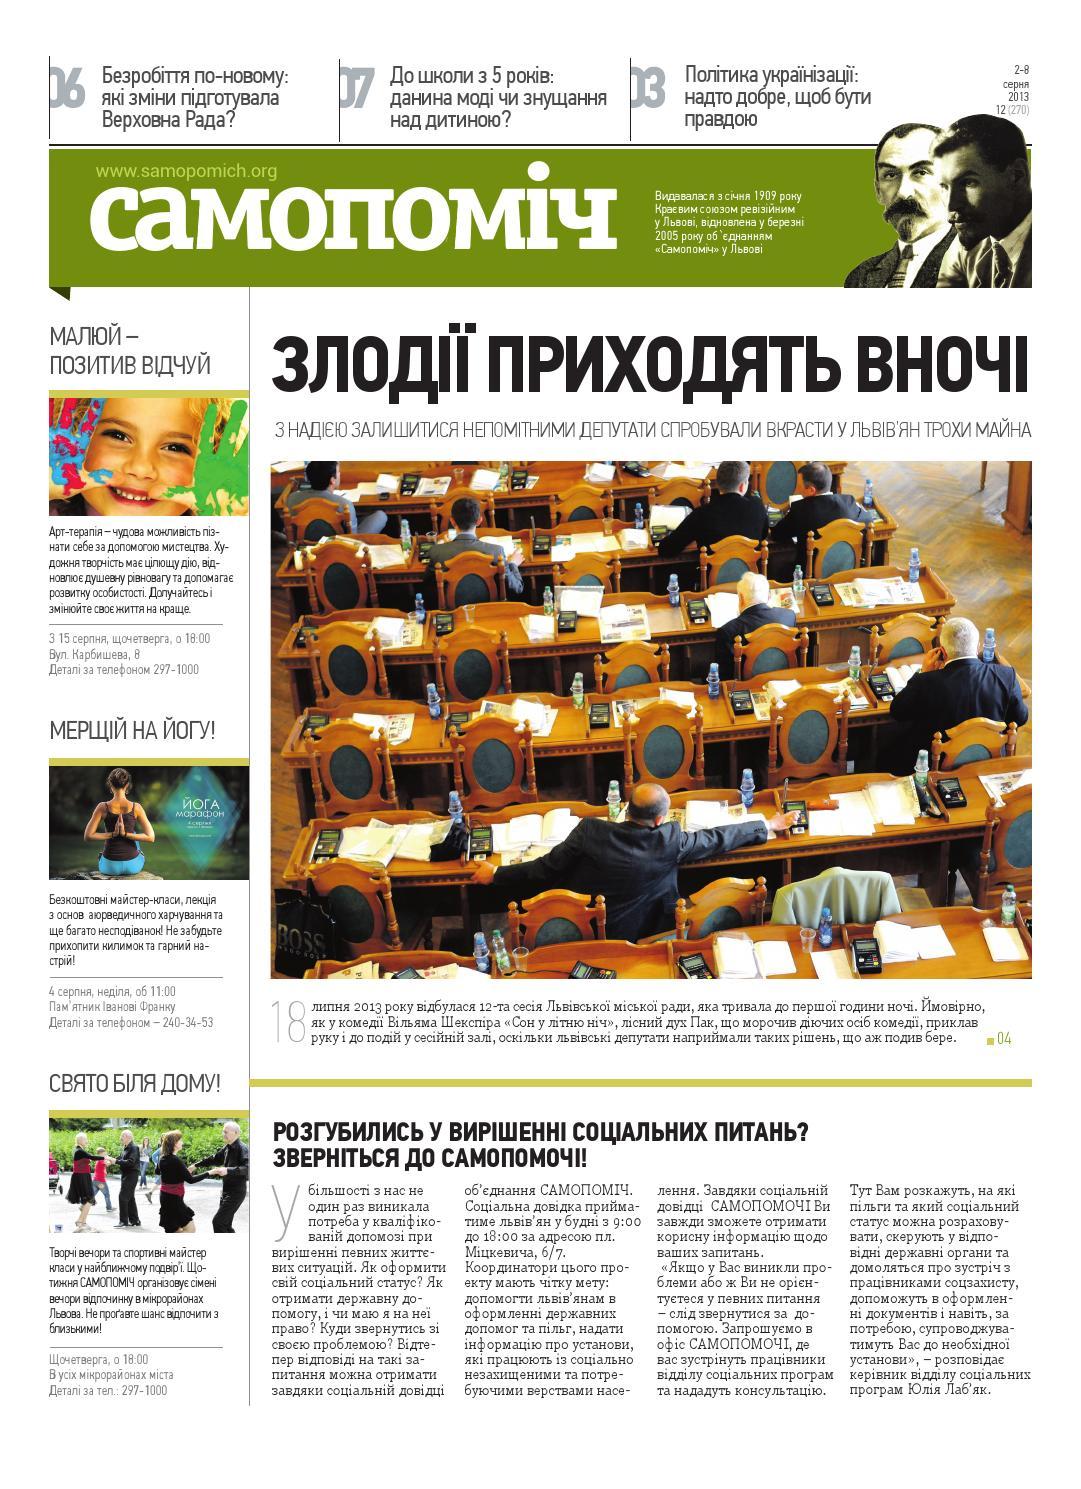 Газета САМОПОМІЧ (2-8 серпня) by samopomi4 NGO - issuu 17ca30ef60b09